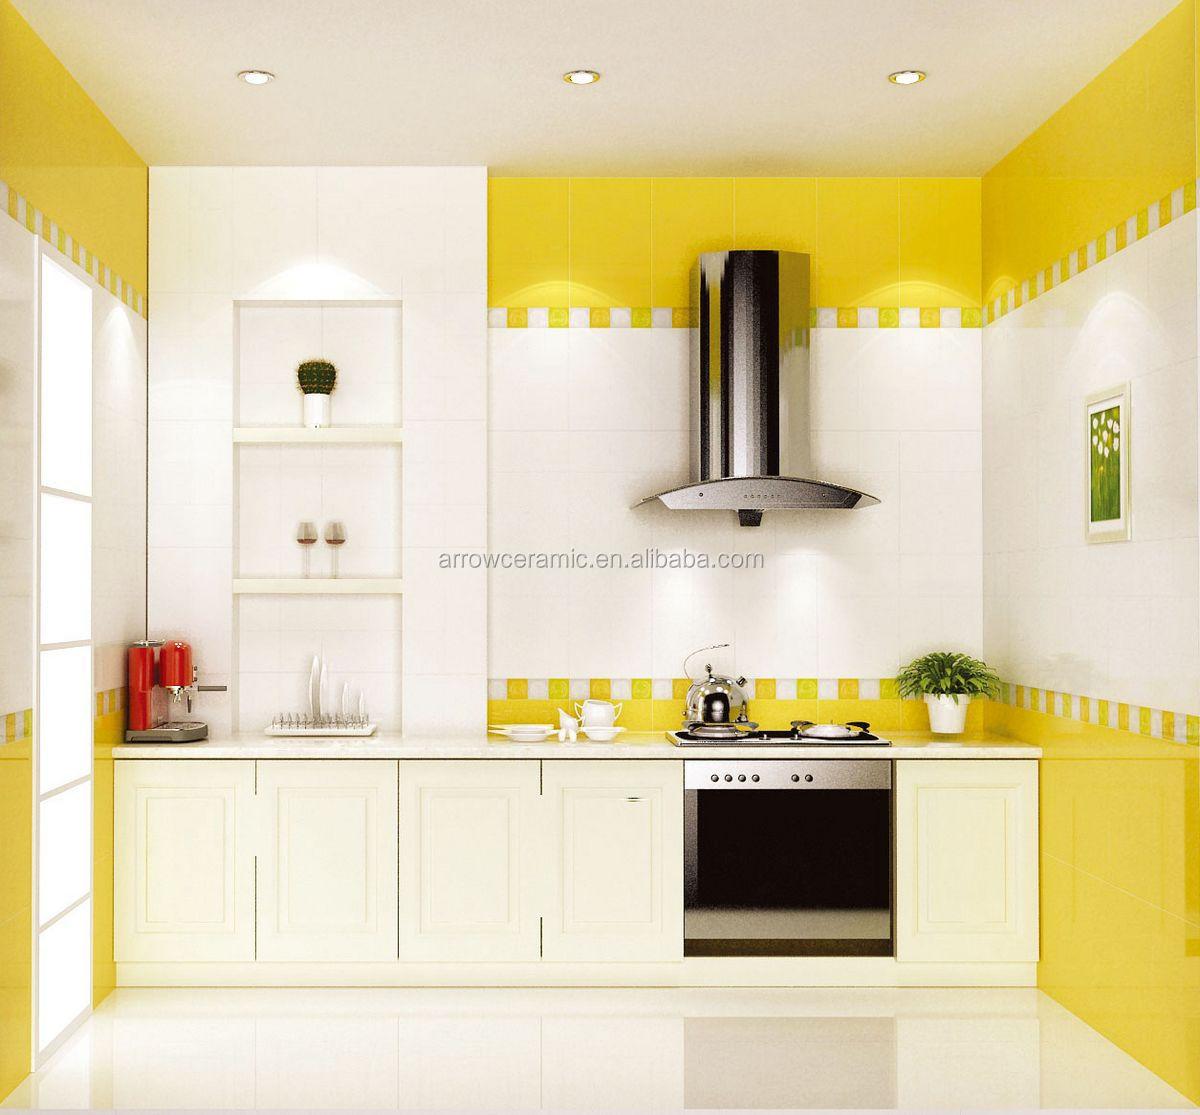 Ceramic Wall Tiles Kitchen Arrow Ceramic Wall Tile 450300mm Bathroom Wall Tiles Kitchen